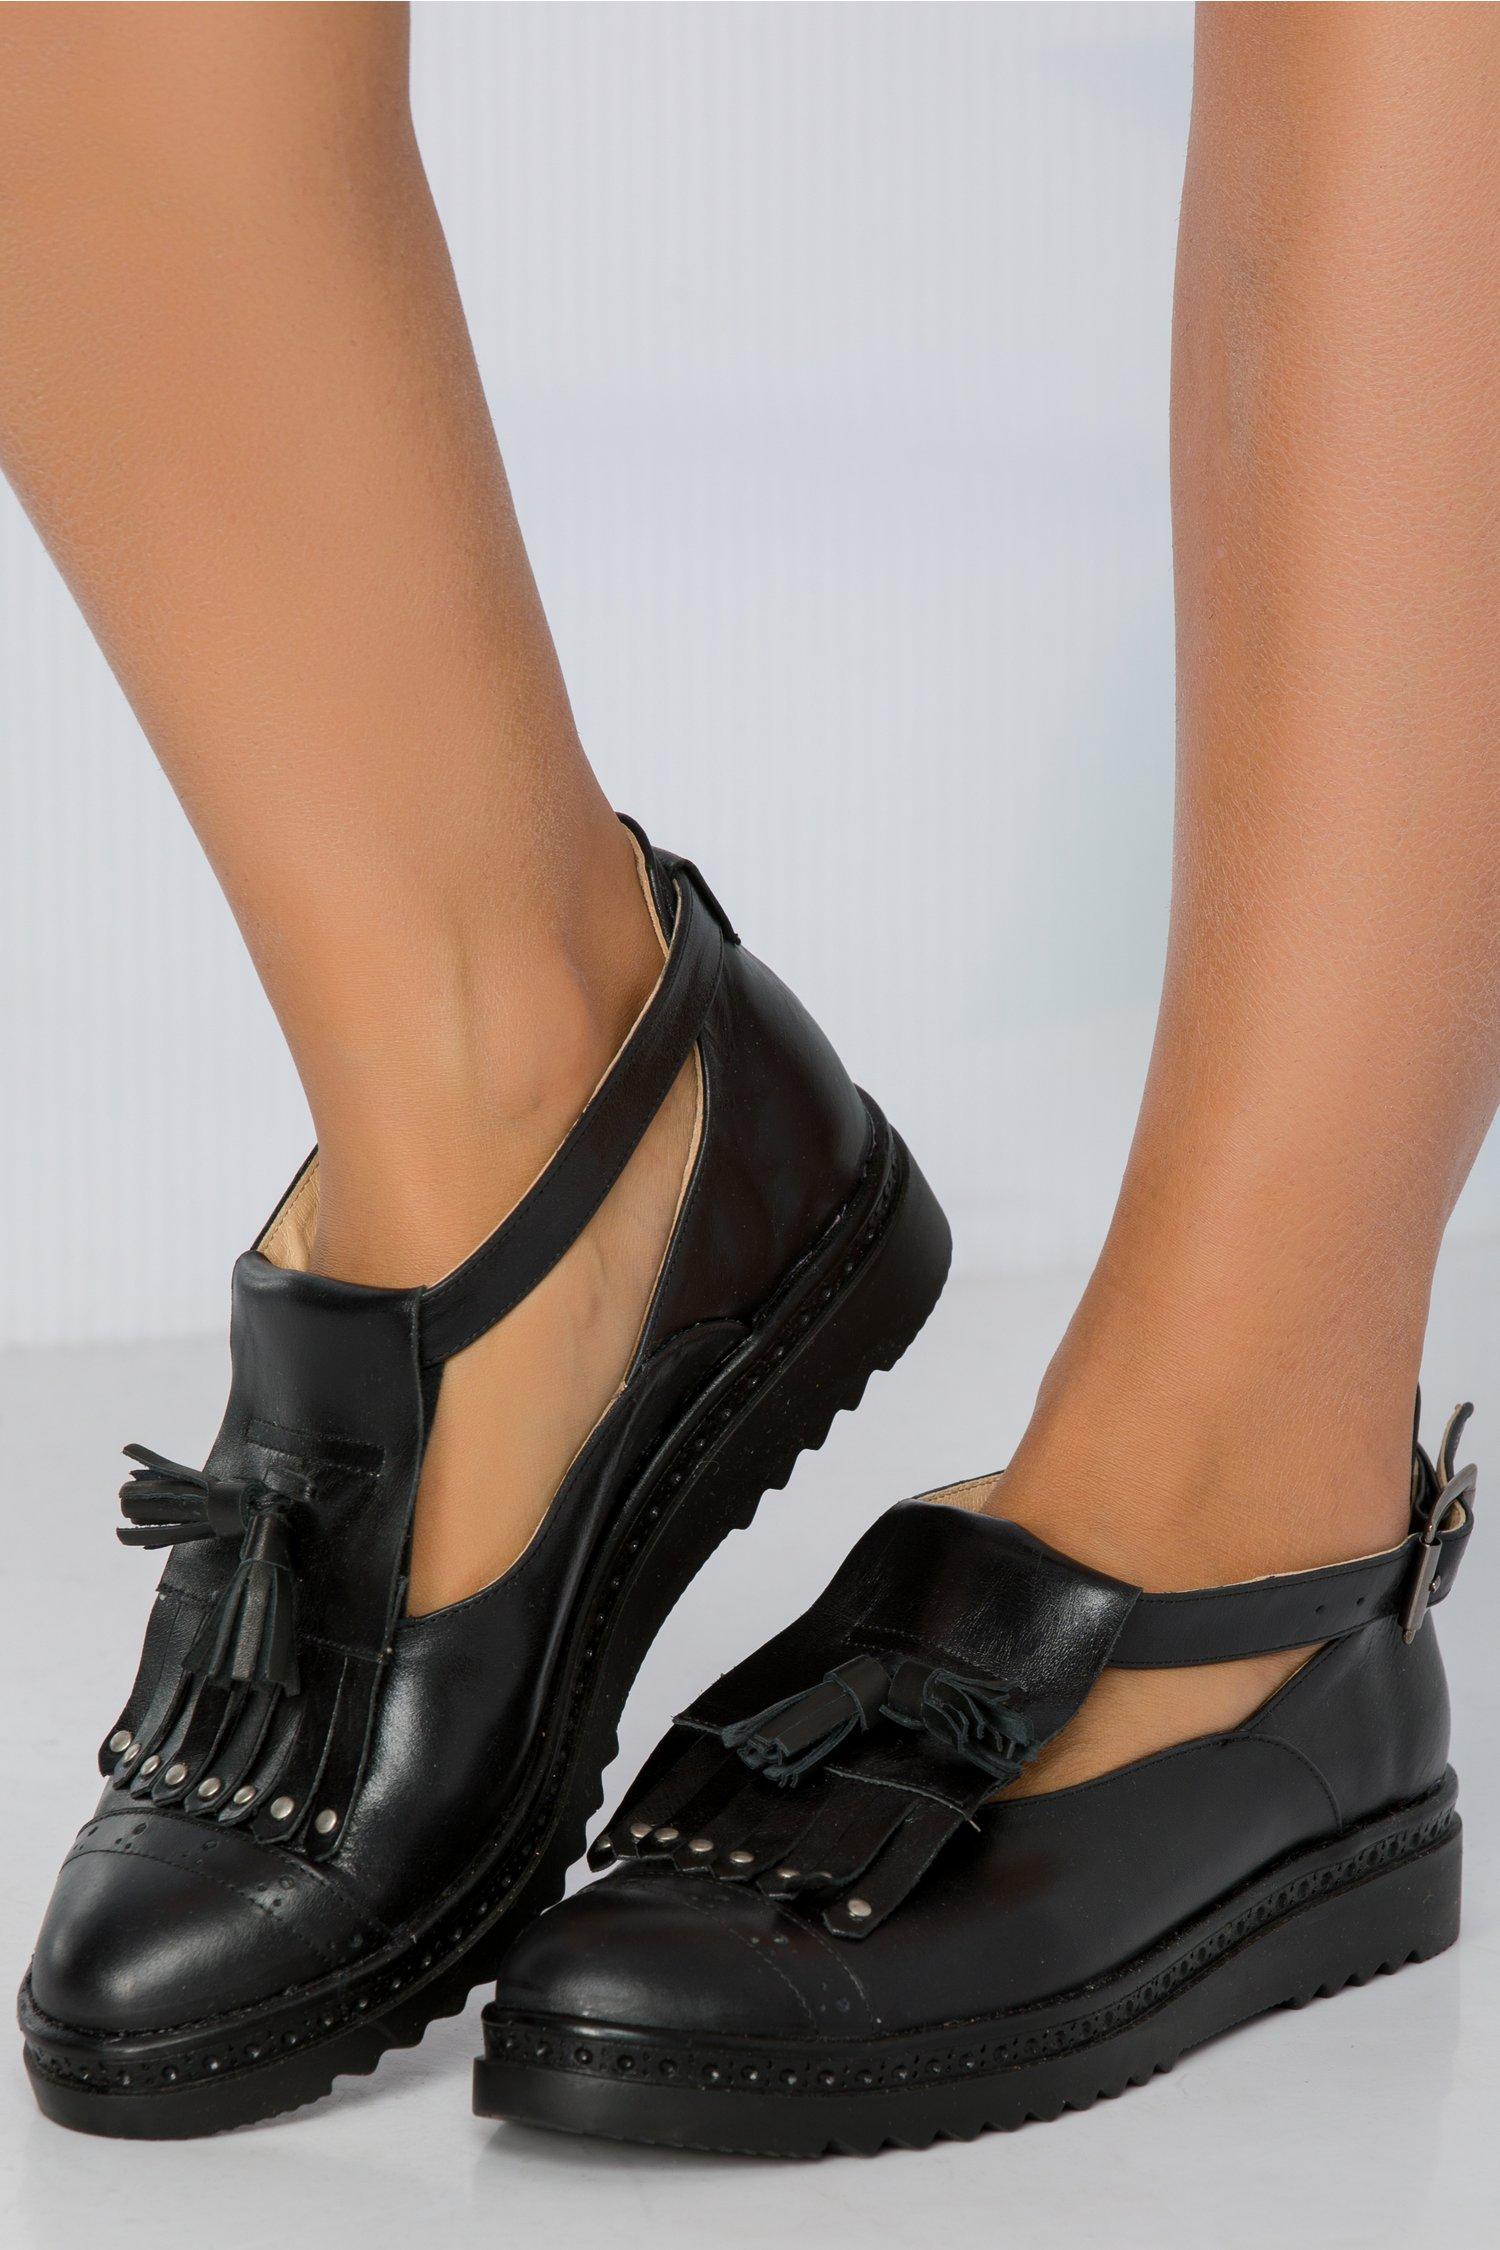 Pantofi Cezara negri cu franjuri